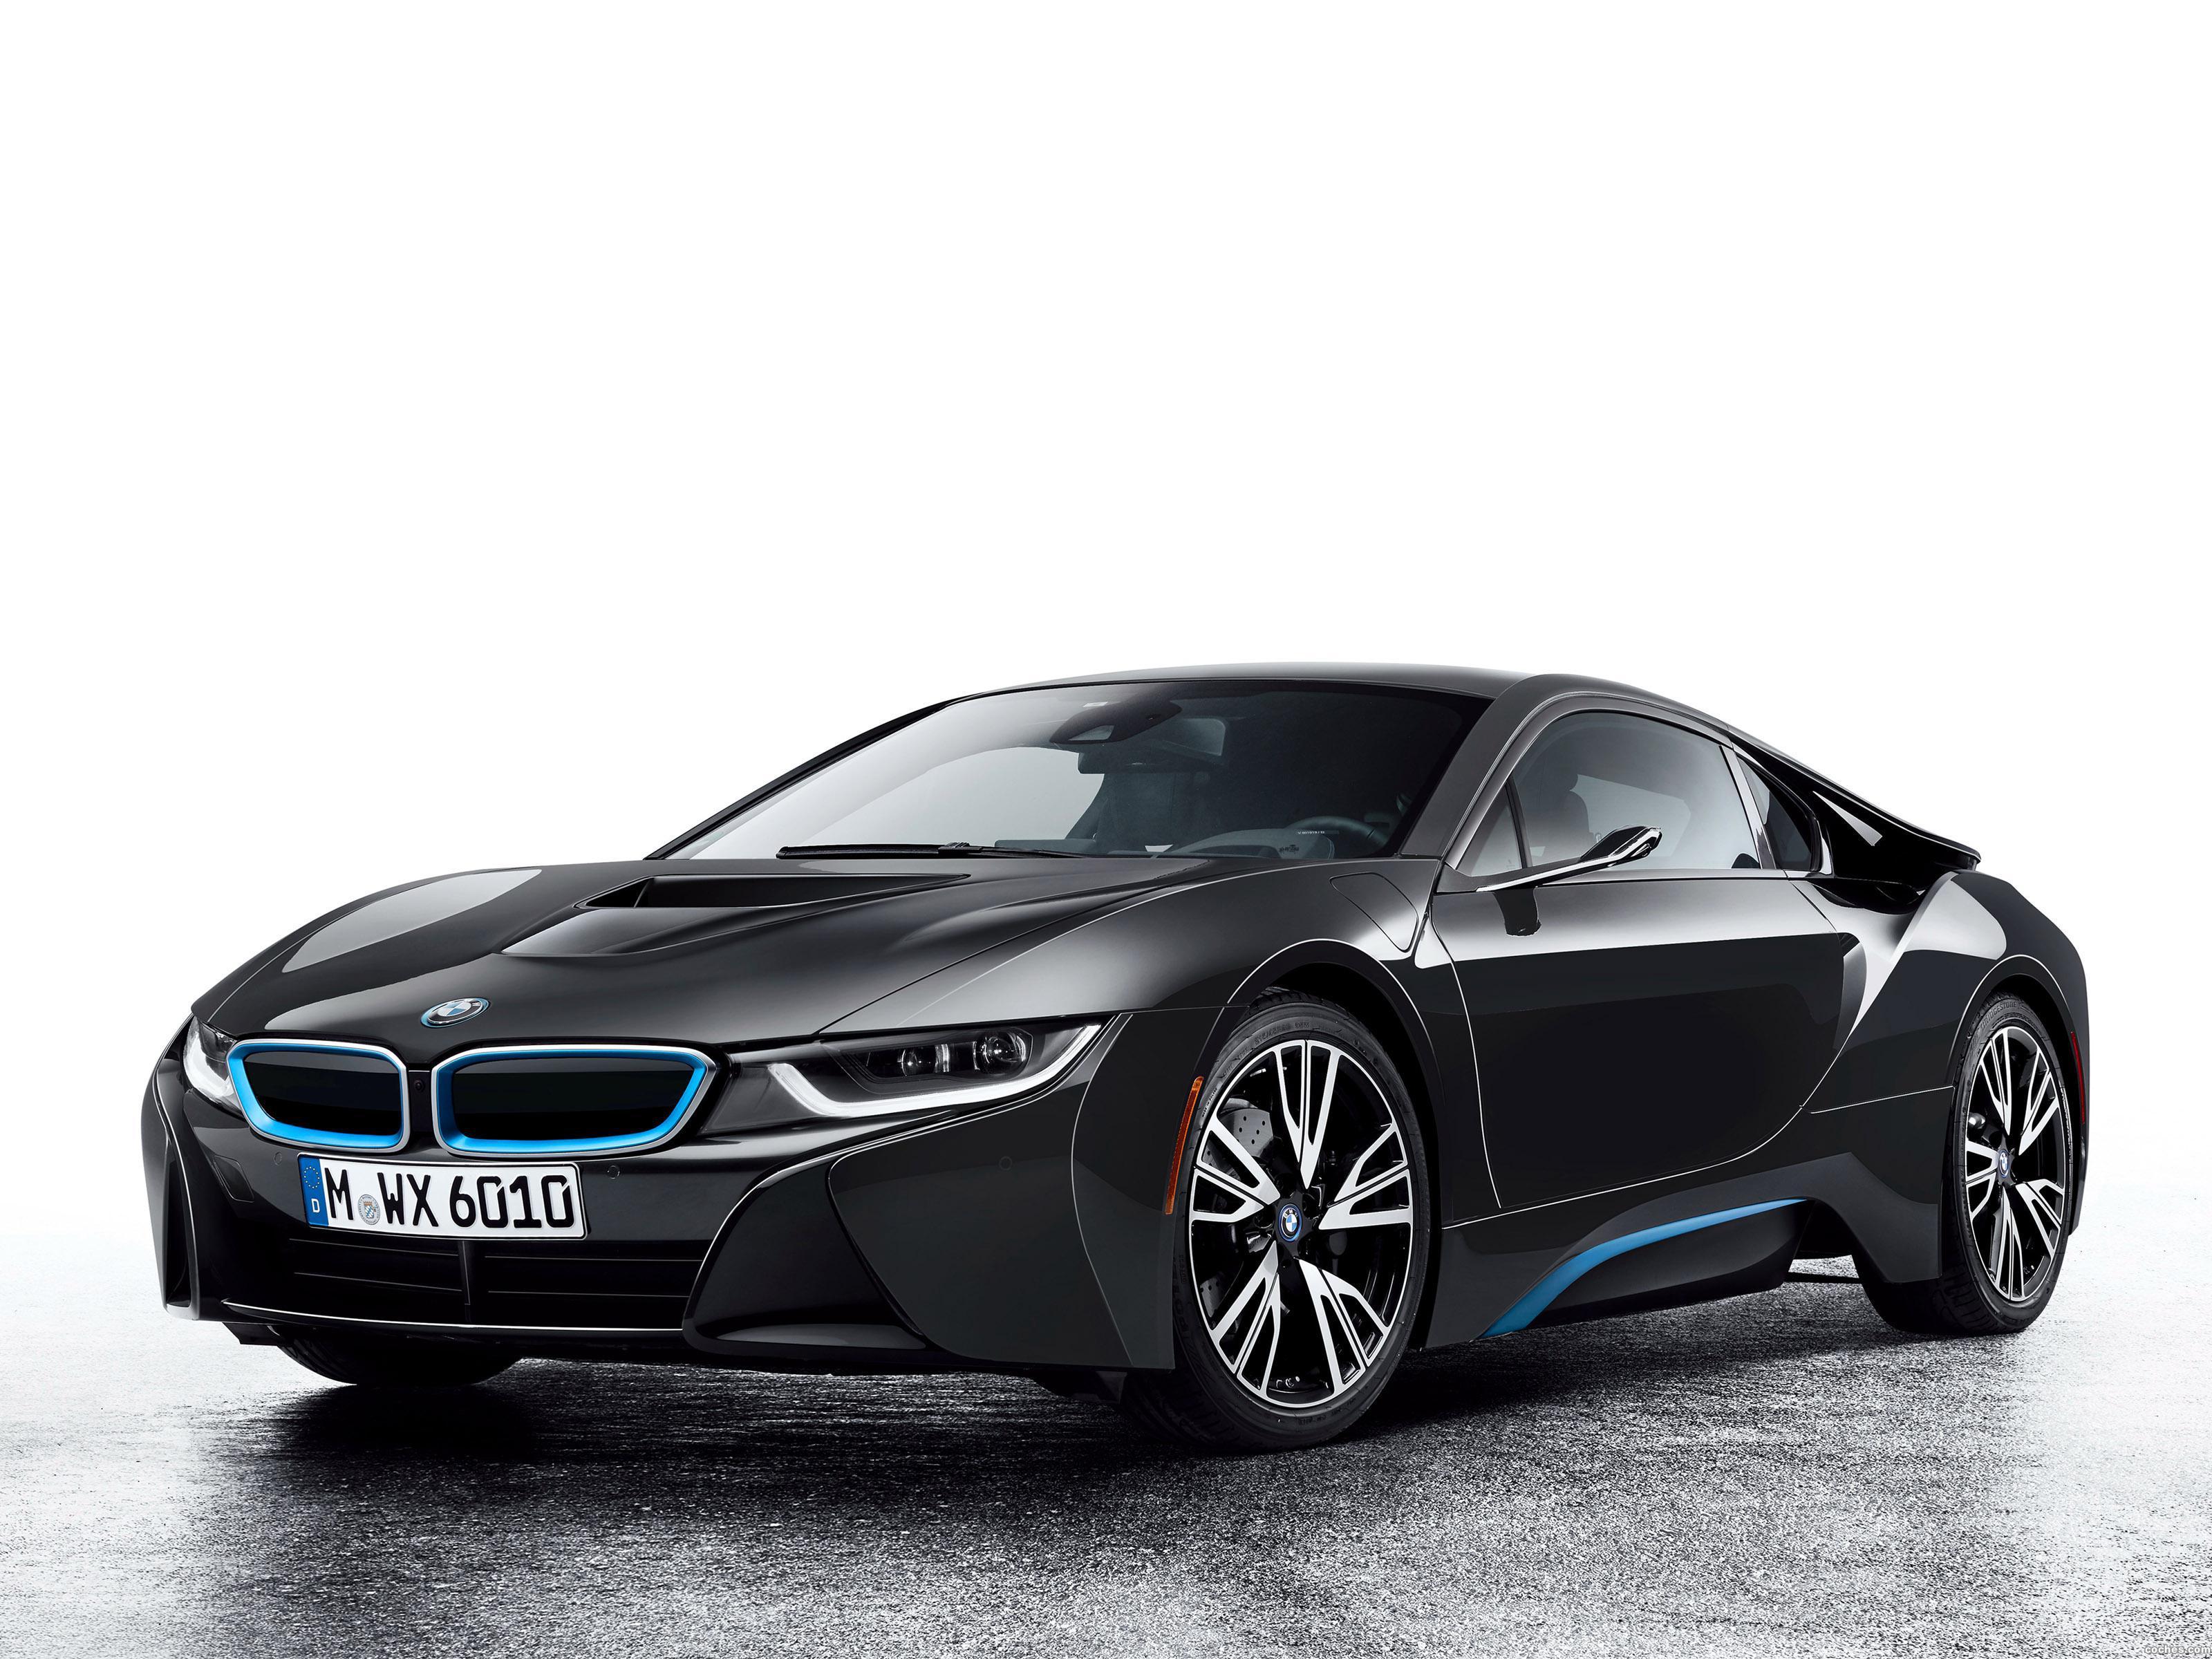 Foto 0 de BMW i8 Mirrorless Concept I12 2016